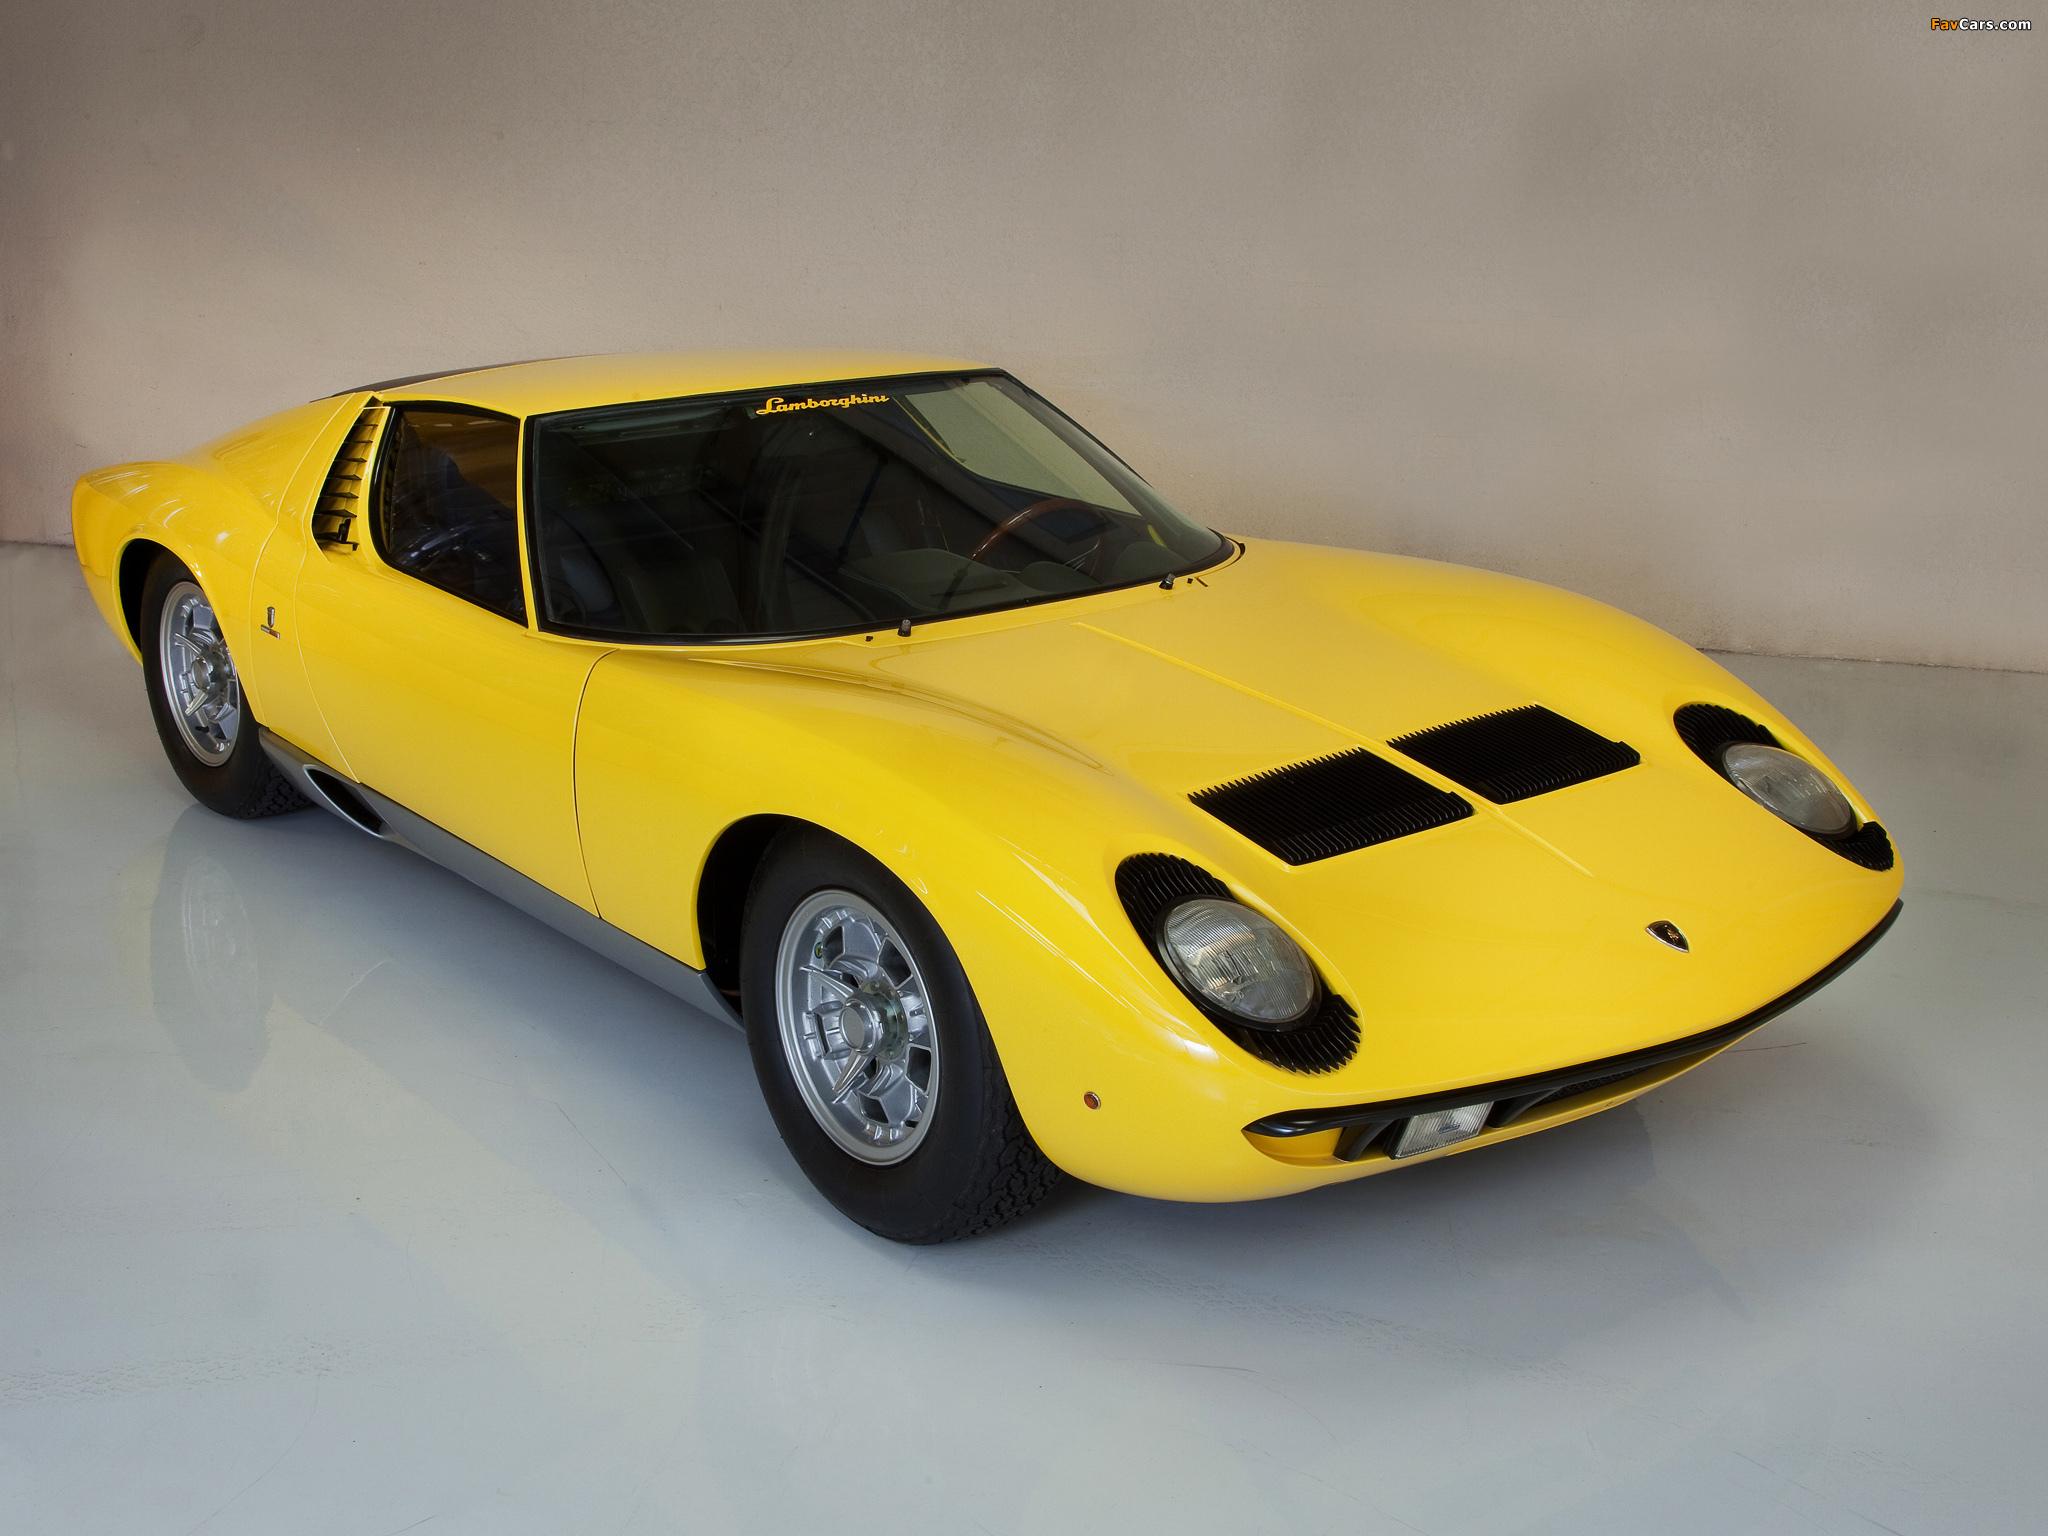 Lamborghini Miura P400 1966 69 Wallpapers 2048x1536